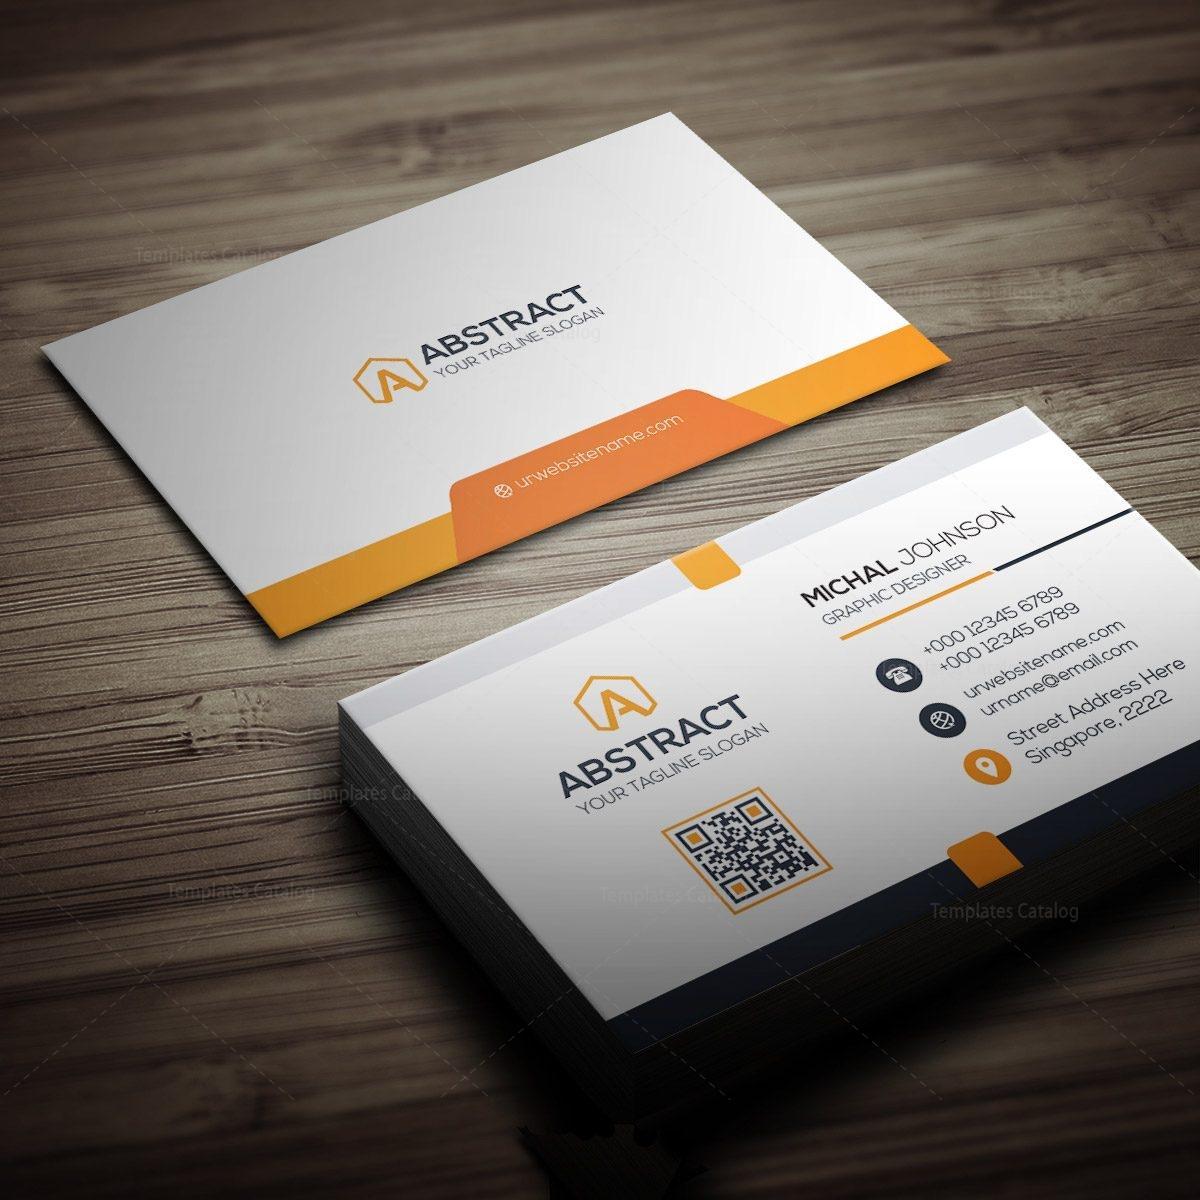 Clean Design Business Card Template 000259 - Template Catalog